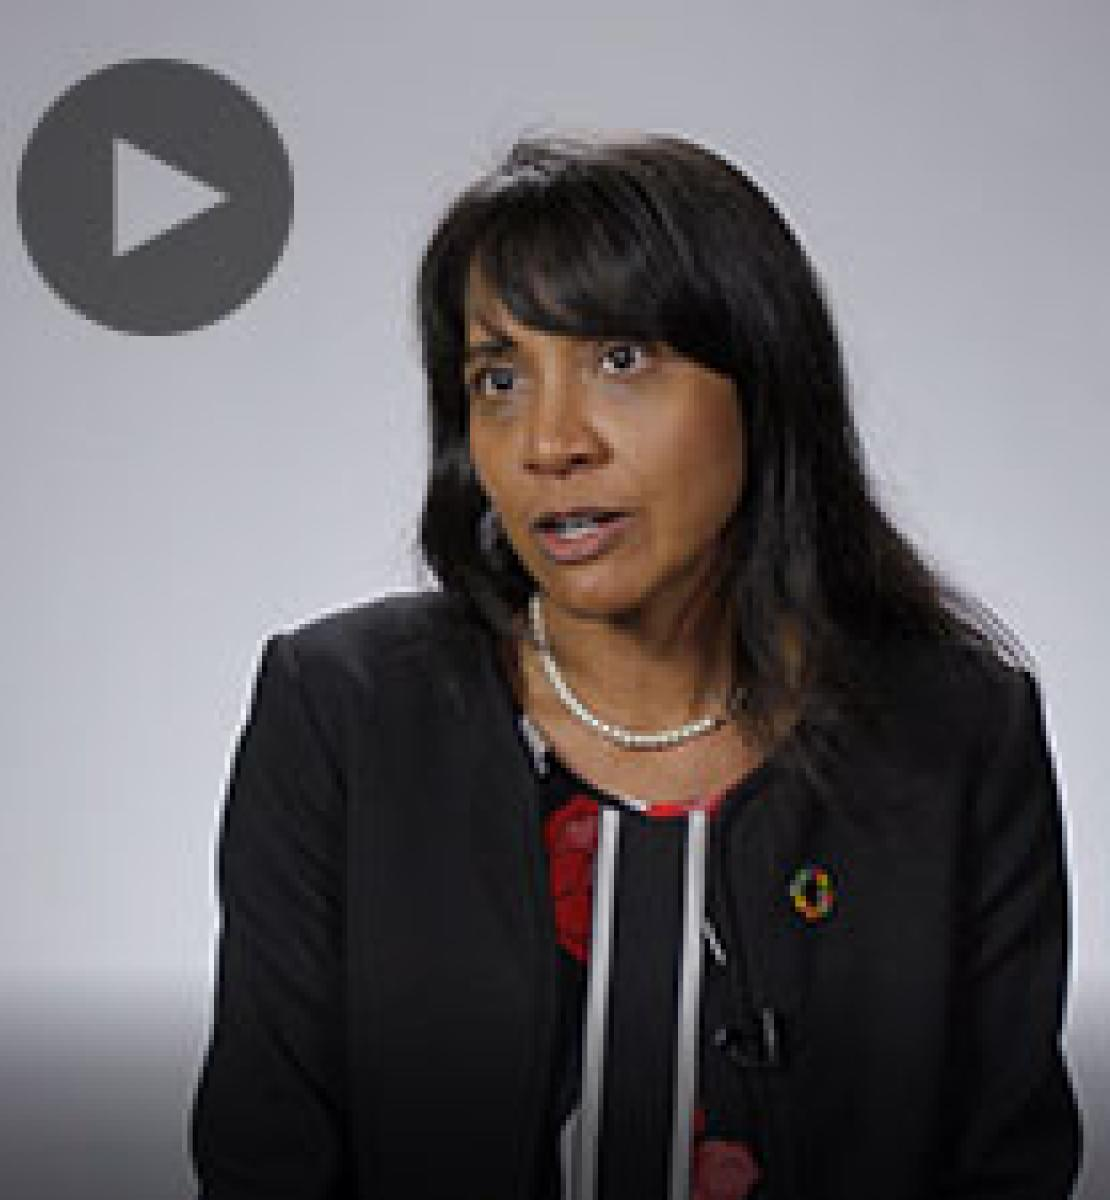 Screenshot from video message shows Resident Coordinator, Priya Gajraj